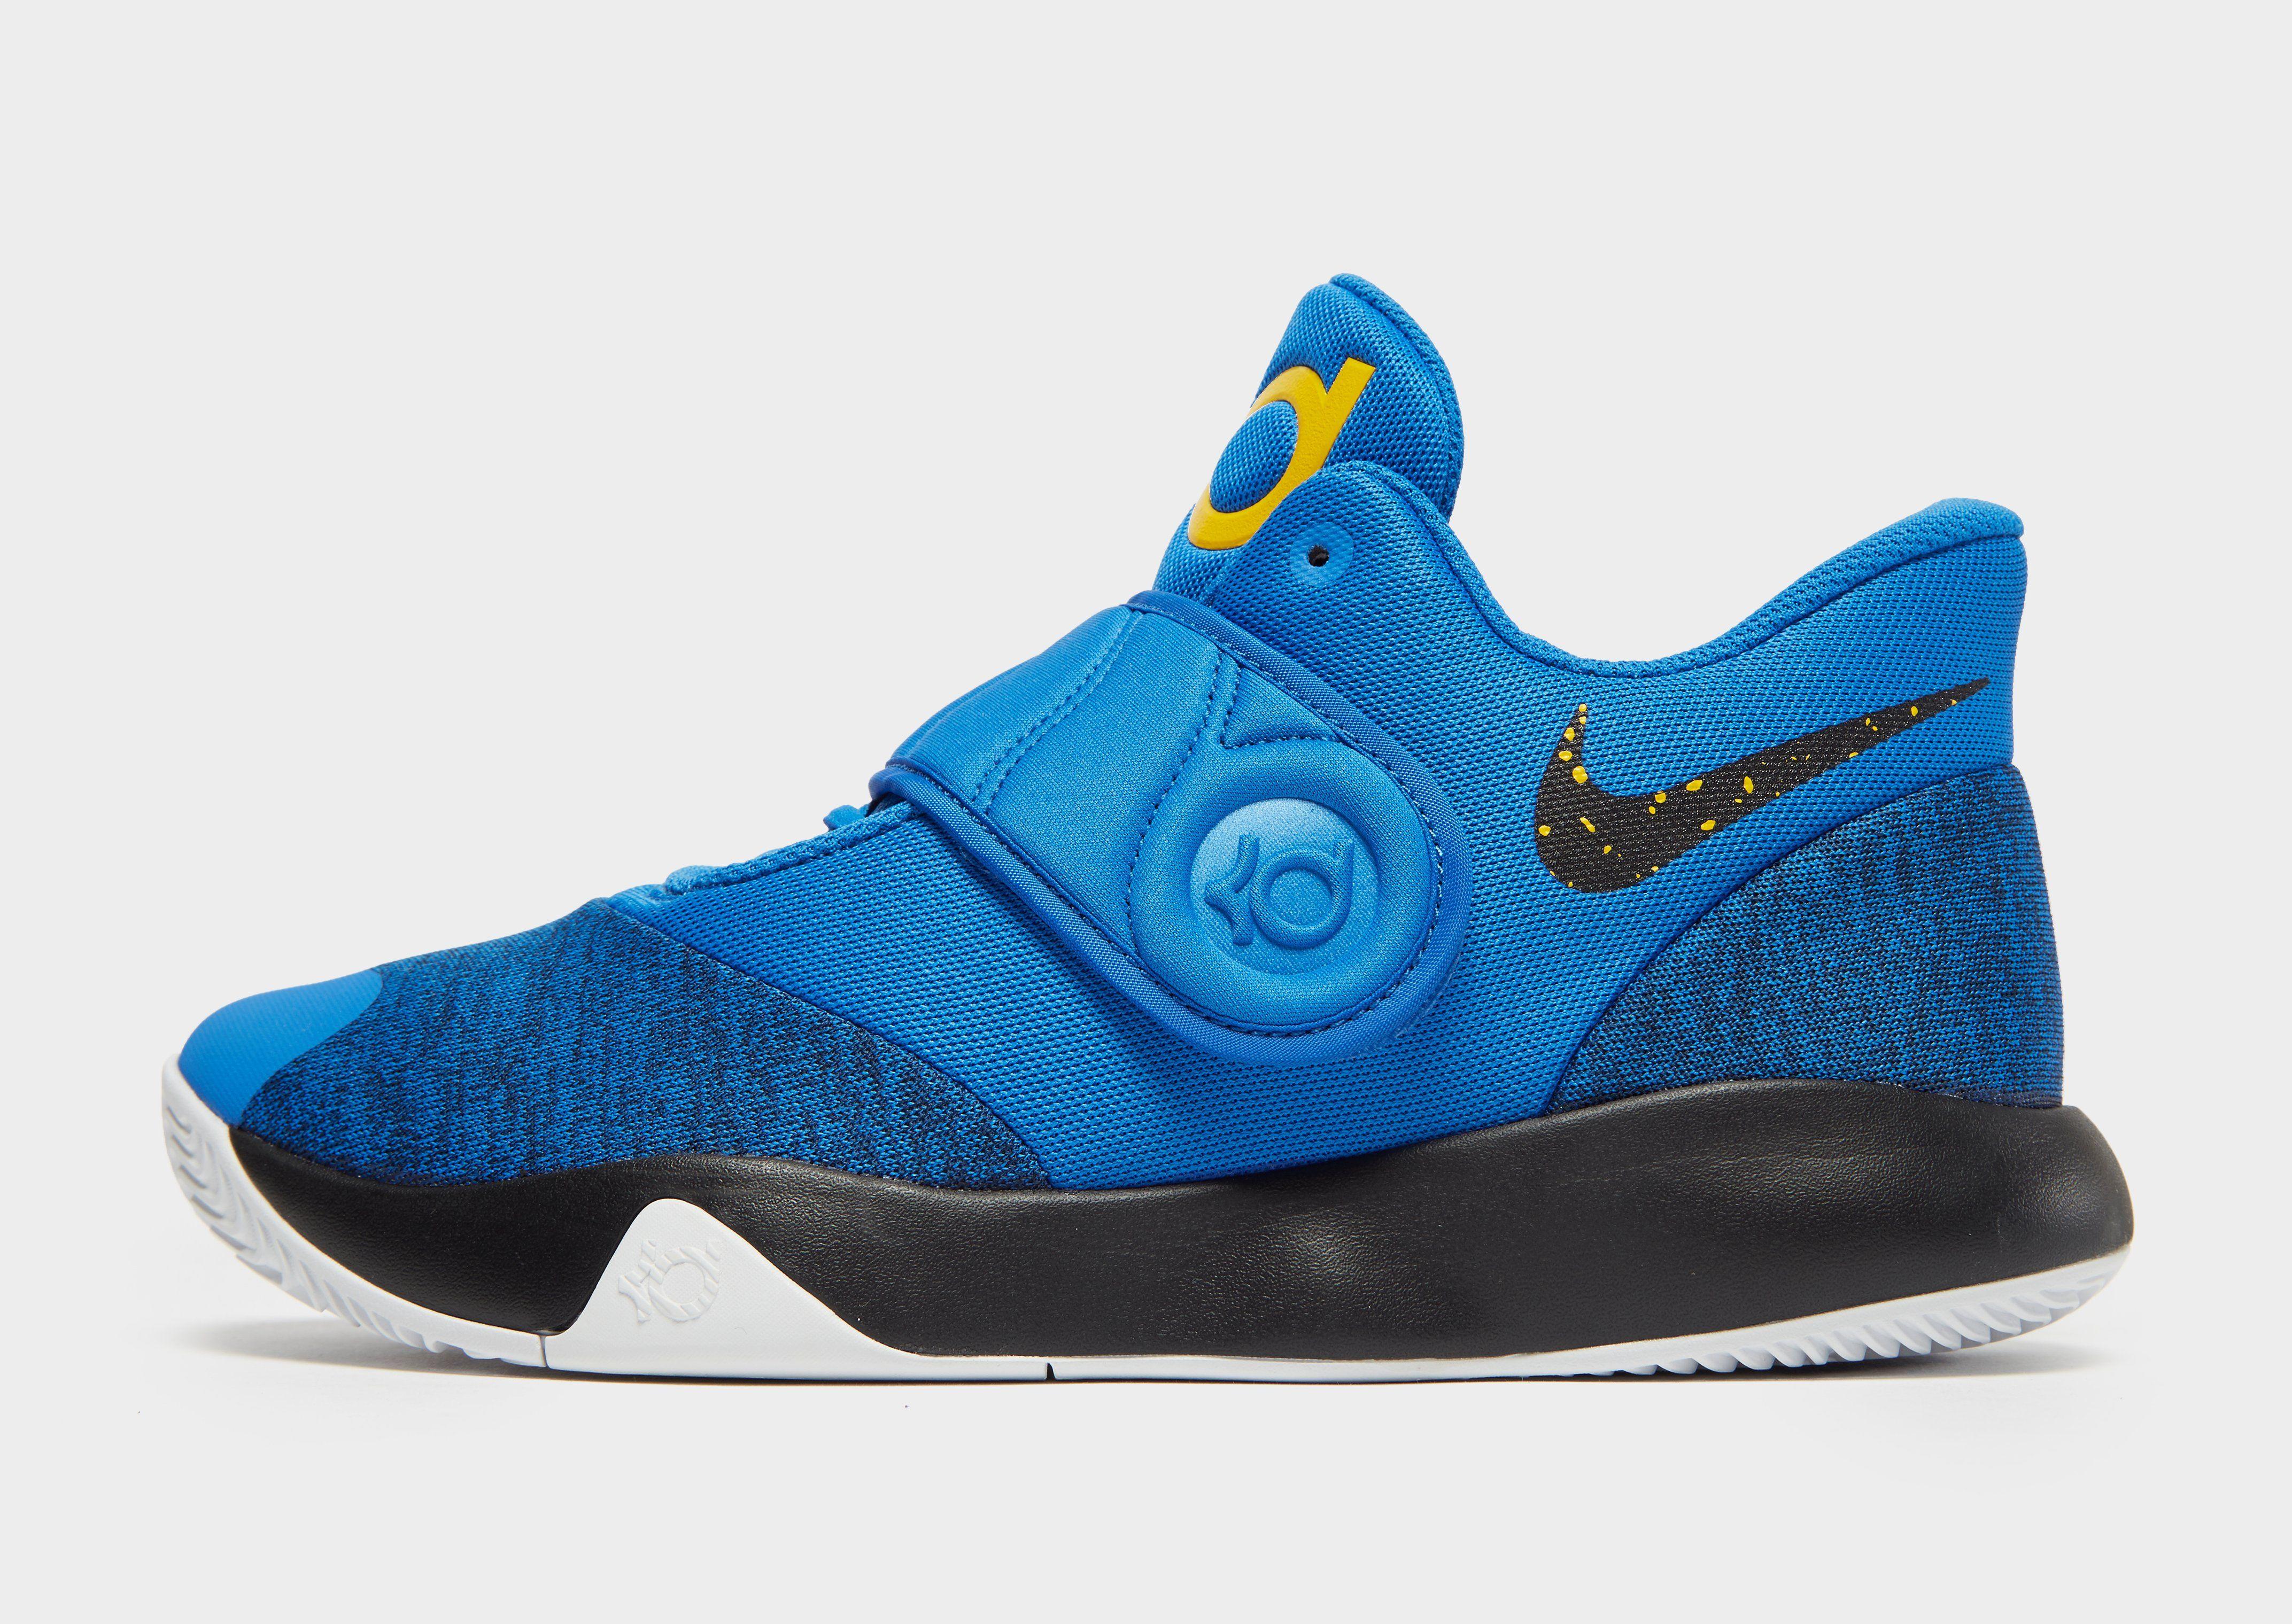 wholesale dealer 03577 072e8 NIKE Nike KD Trey 5 VI Basketball Shoe   JD Sports